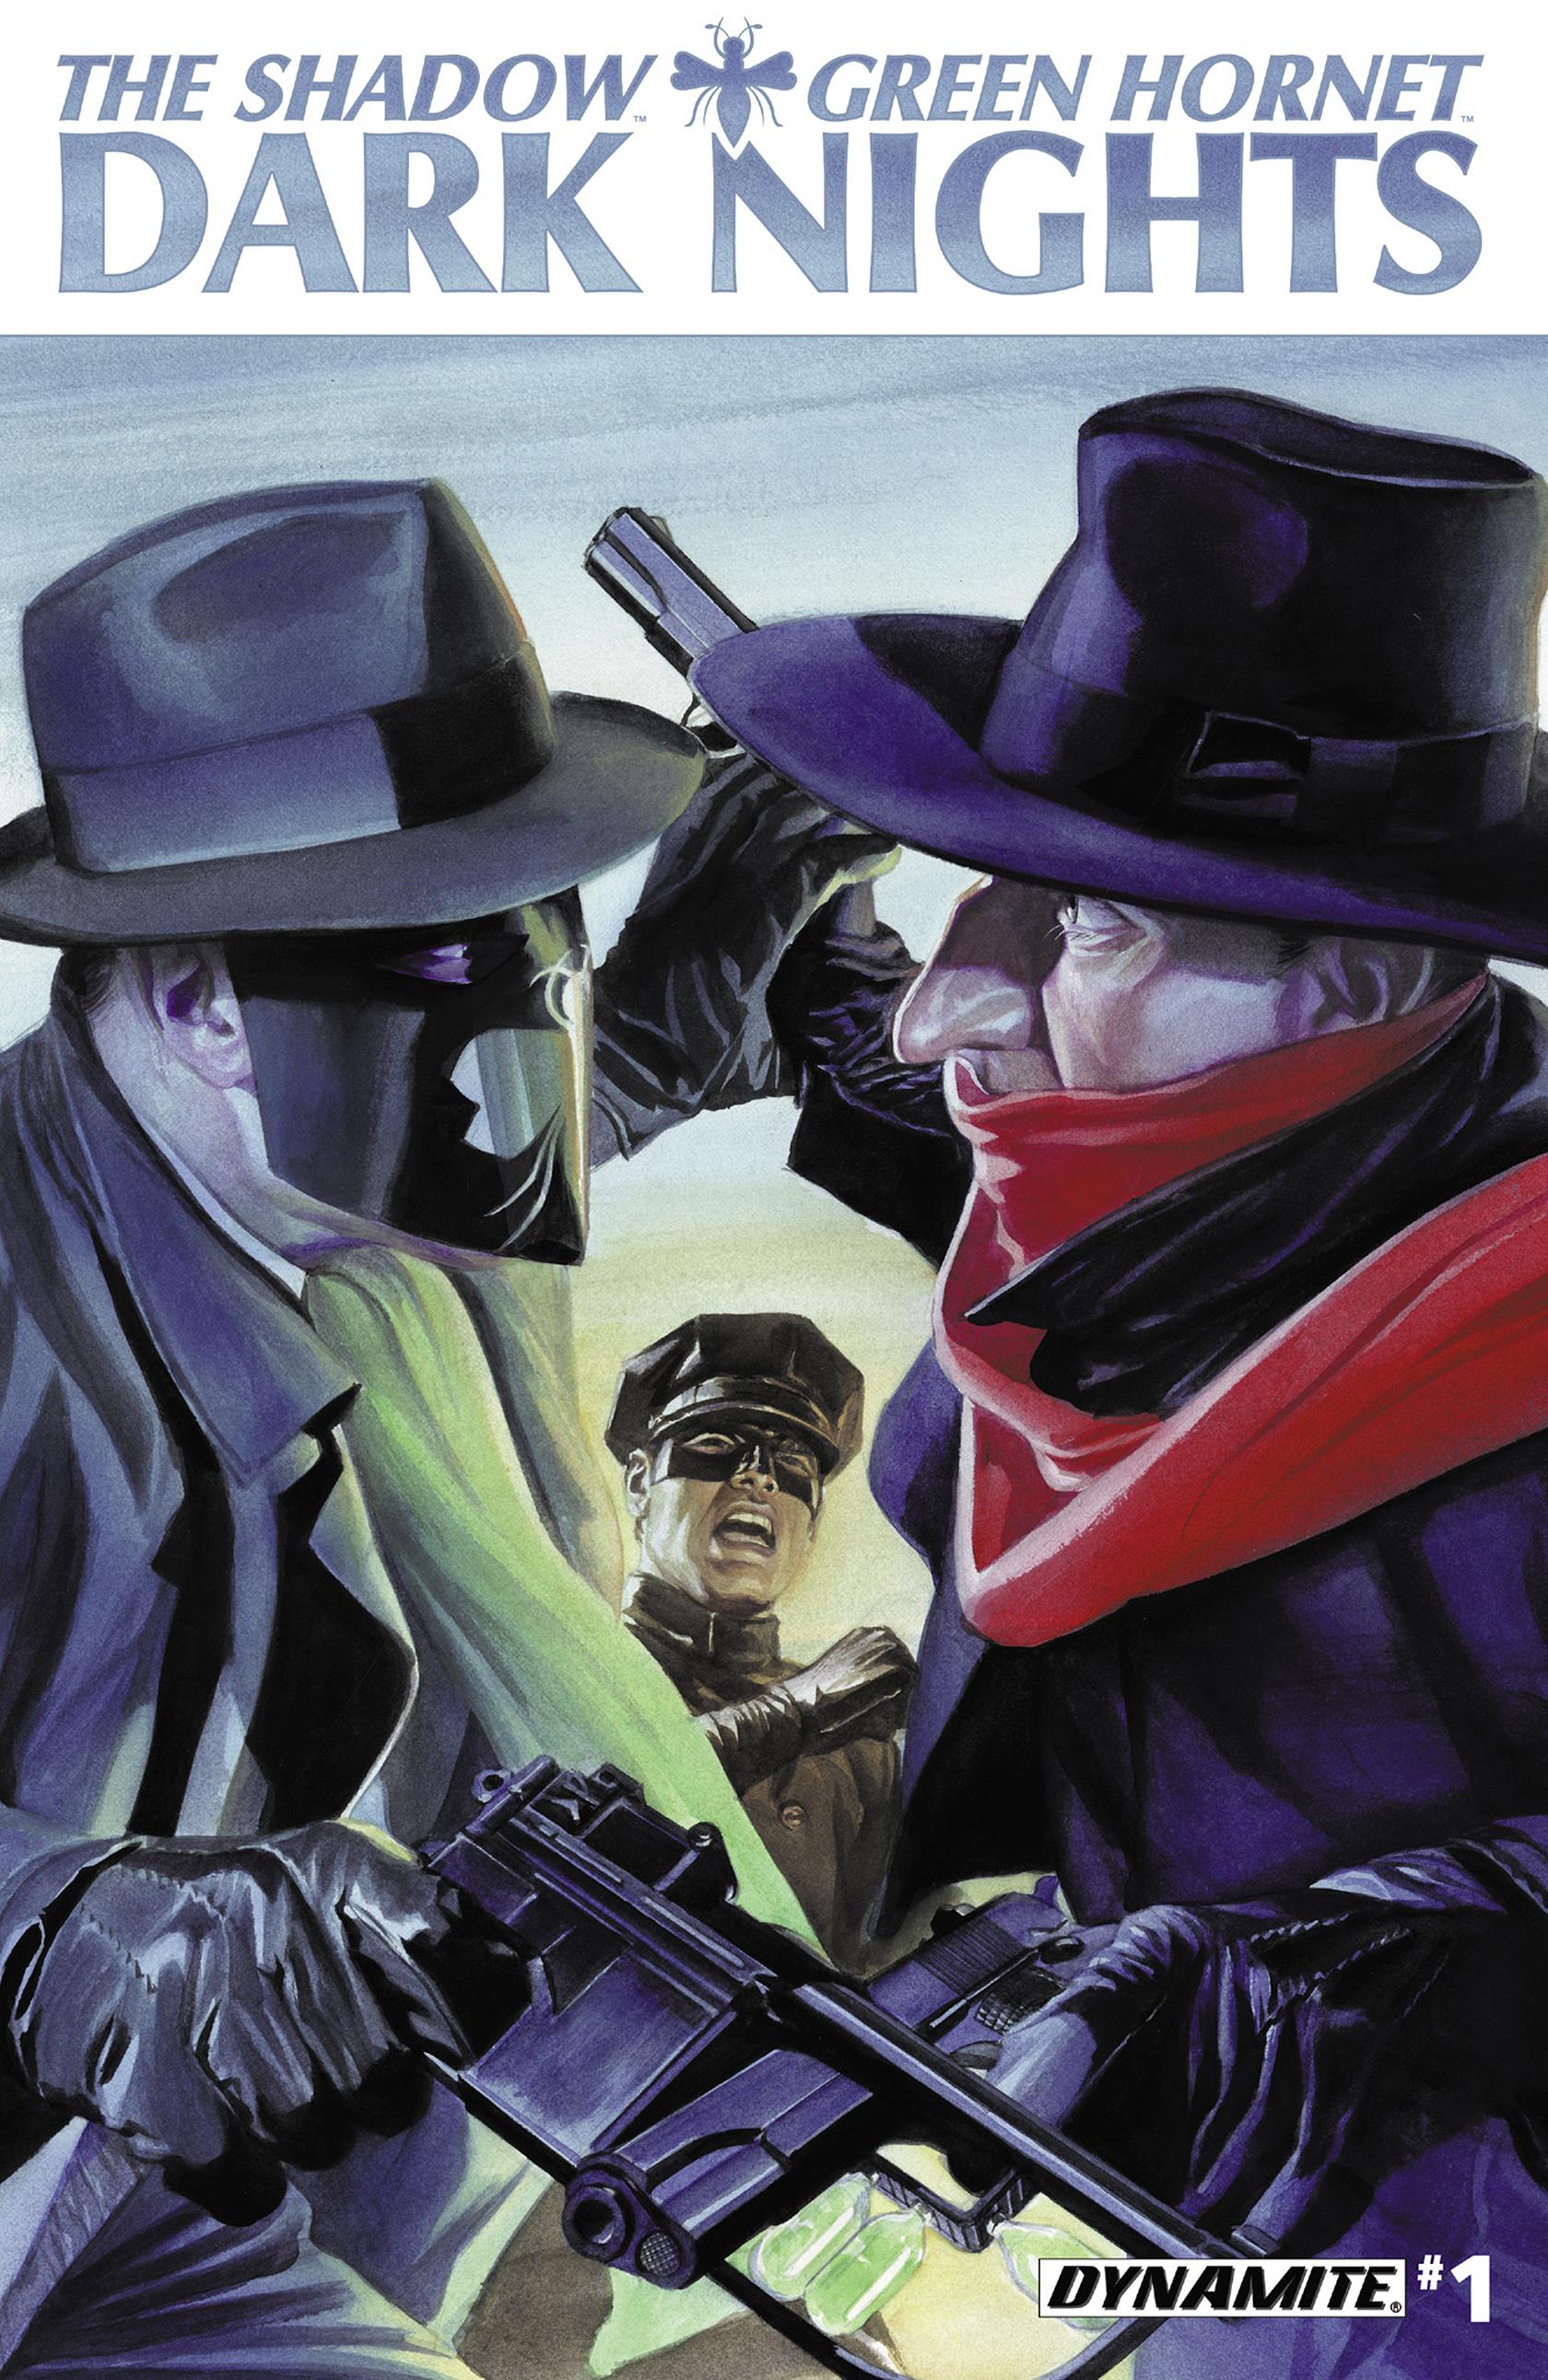 The Shadow/Green Hornet: Dark Nights 1 Page 1